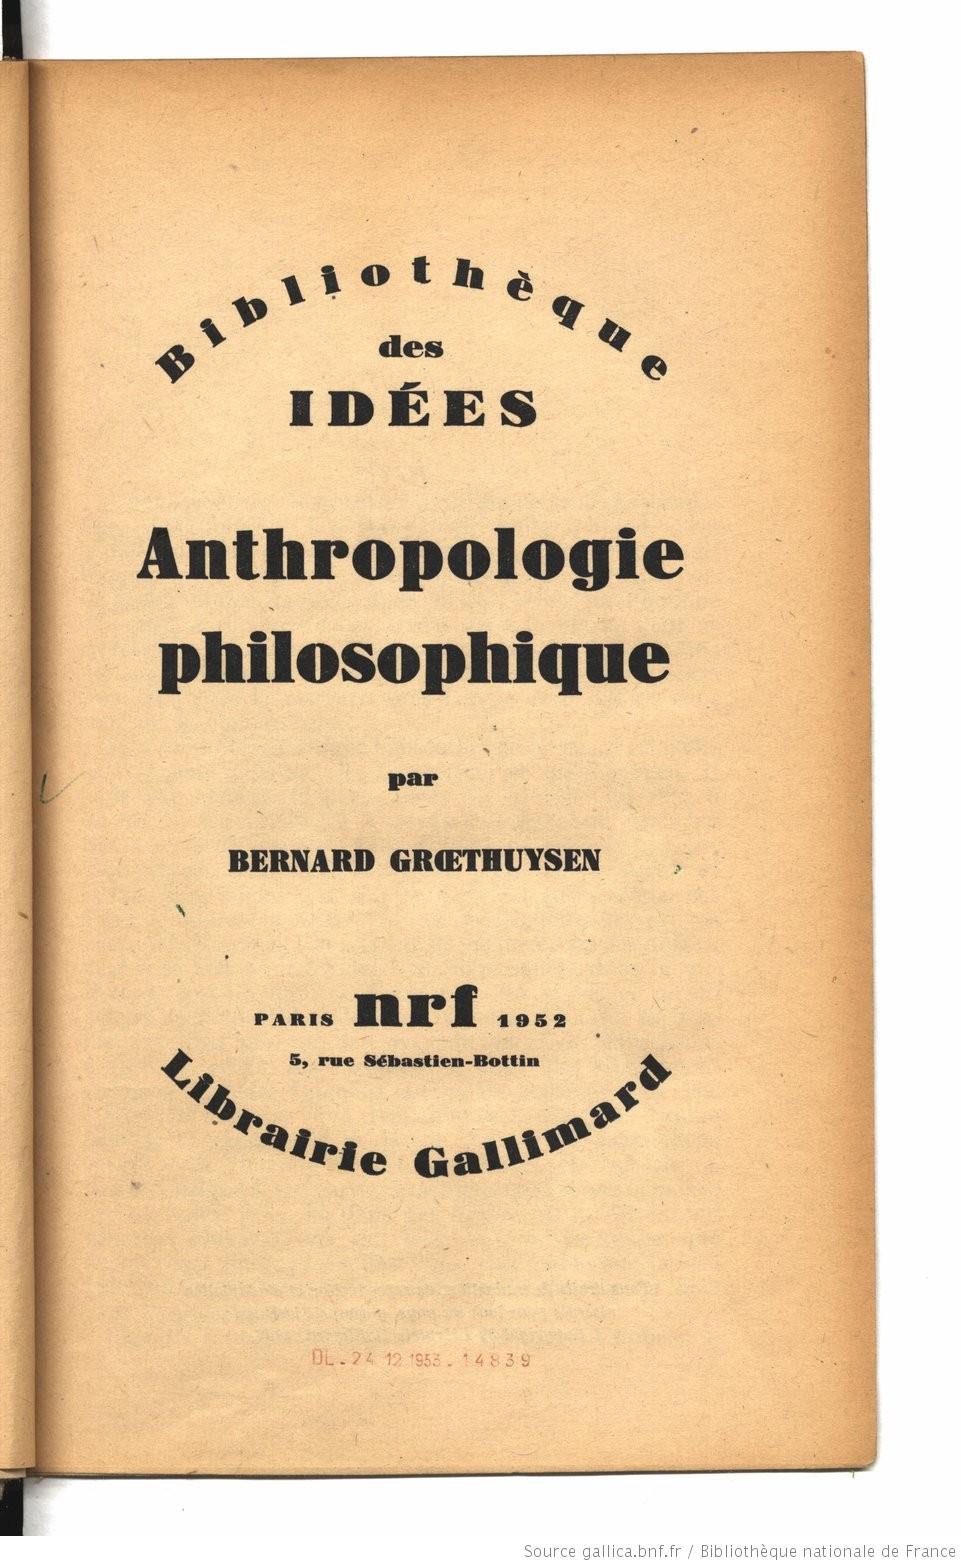 Anthropologie_philosophique___par_Bernard_[...]Groethuysen_Bernard_bpt6k9390684 cover.jpeg